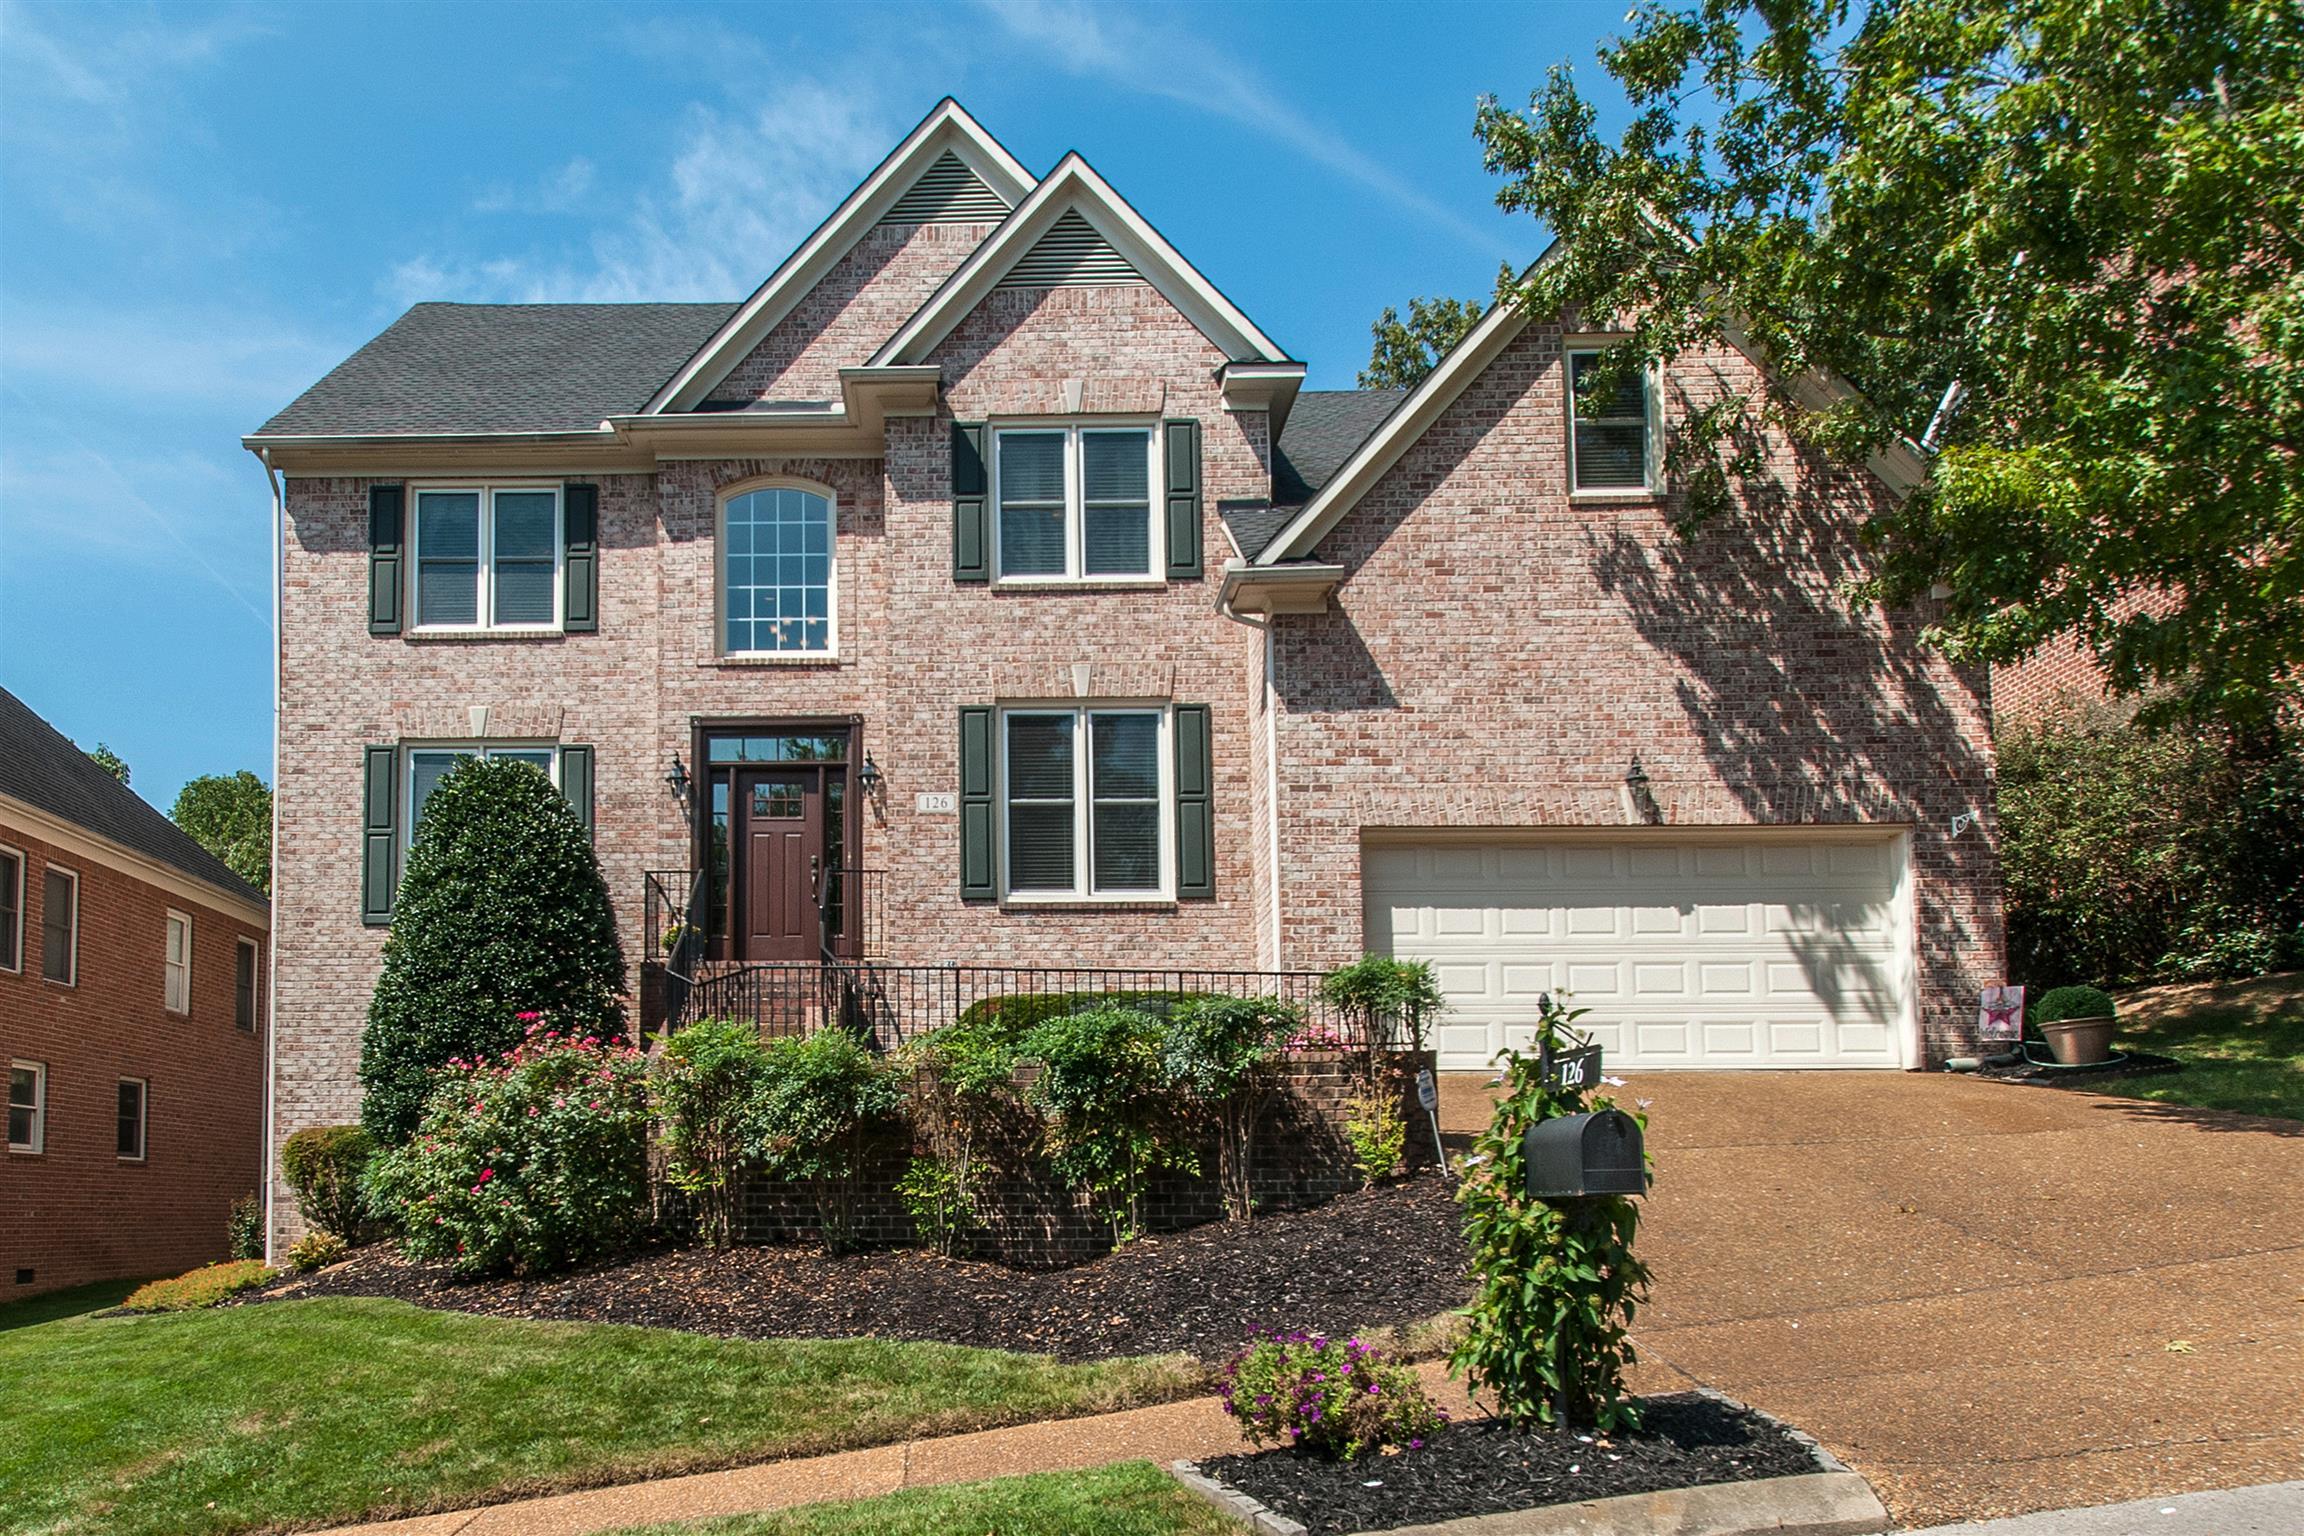 126 Carphilly Cir, Franklin, TN 37069 - Franklin, TN real estate listing